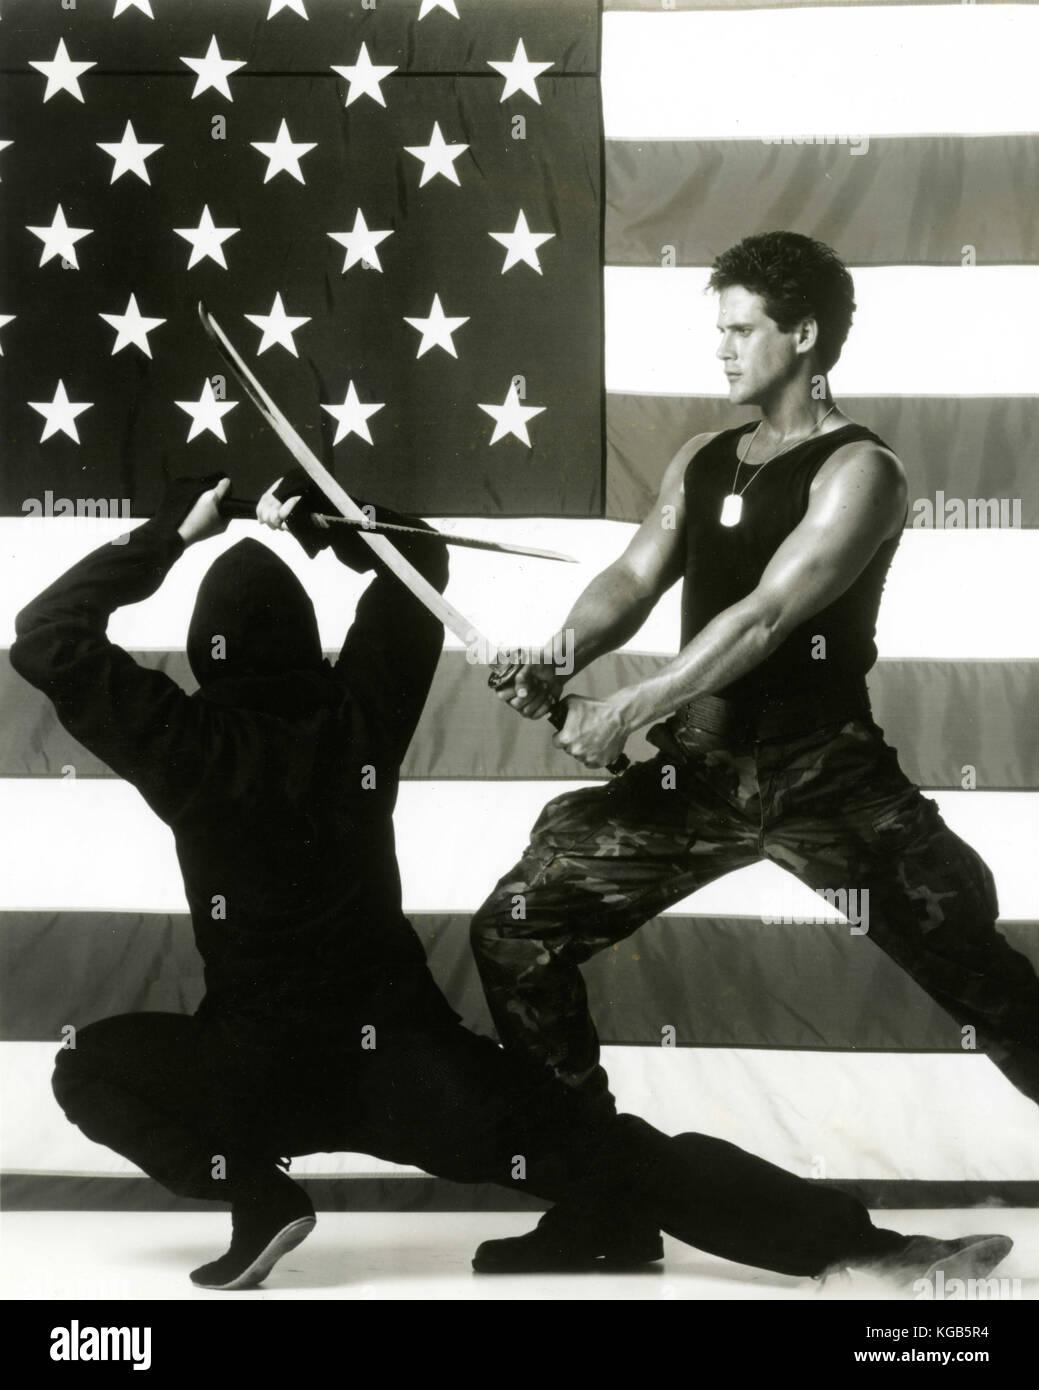 Schauspieler Michael Dudikoff in dem Film American Ninja, 1985 Stockbild